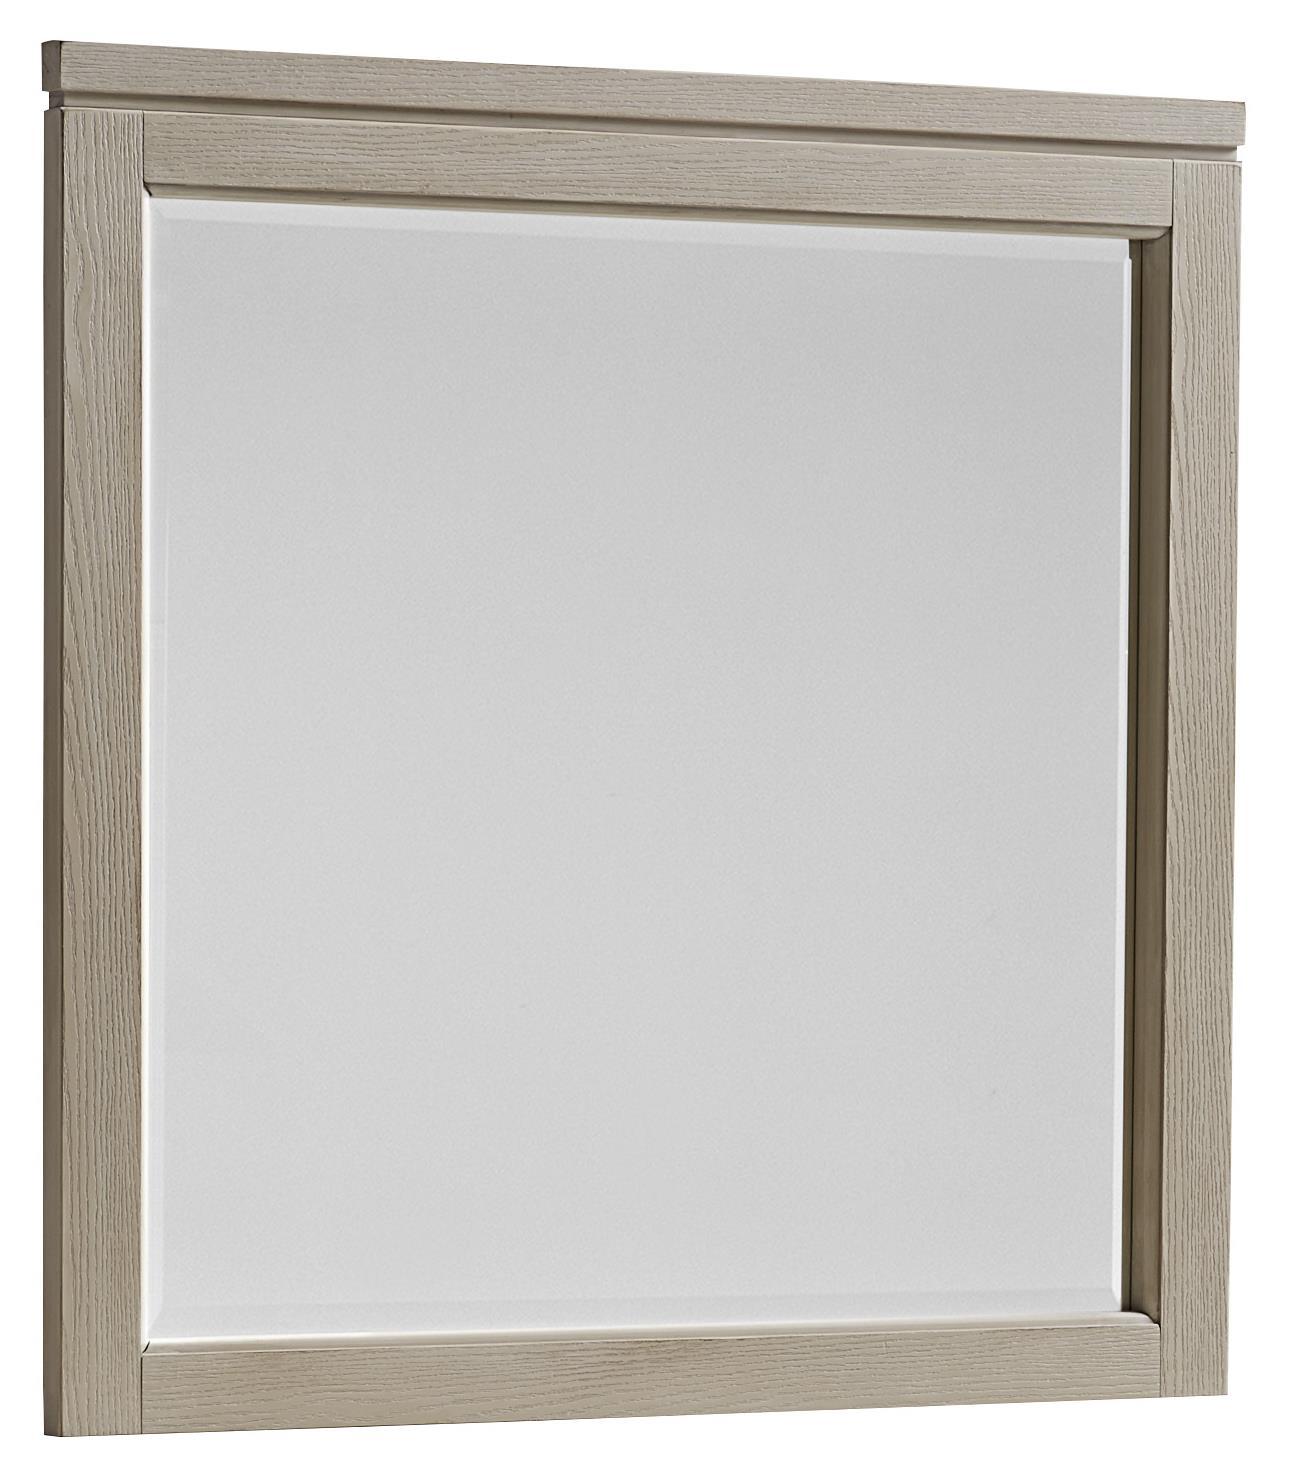 Vaughan Bassett Kismet Landscape Mirror - Item Number: 412-446